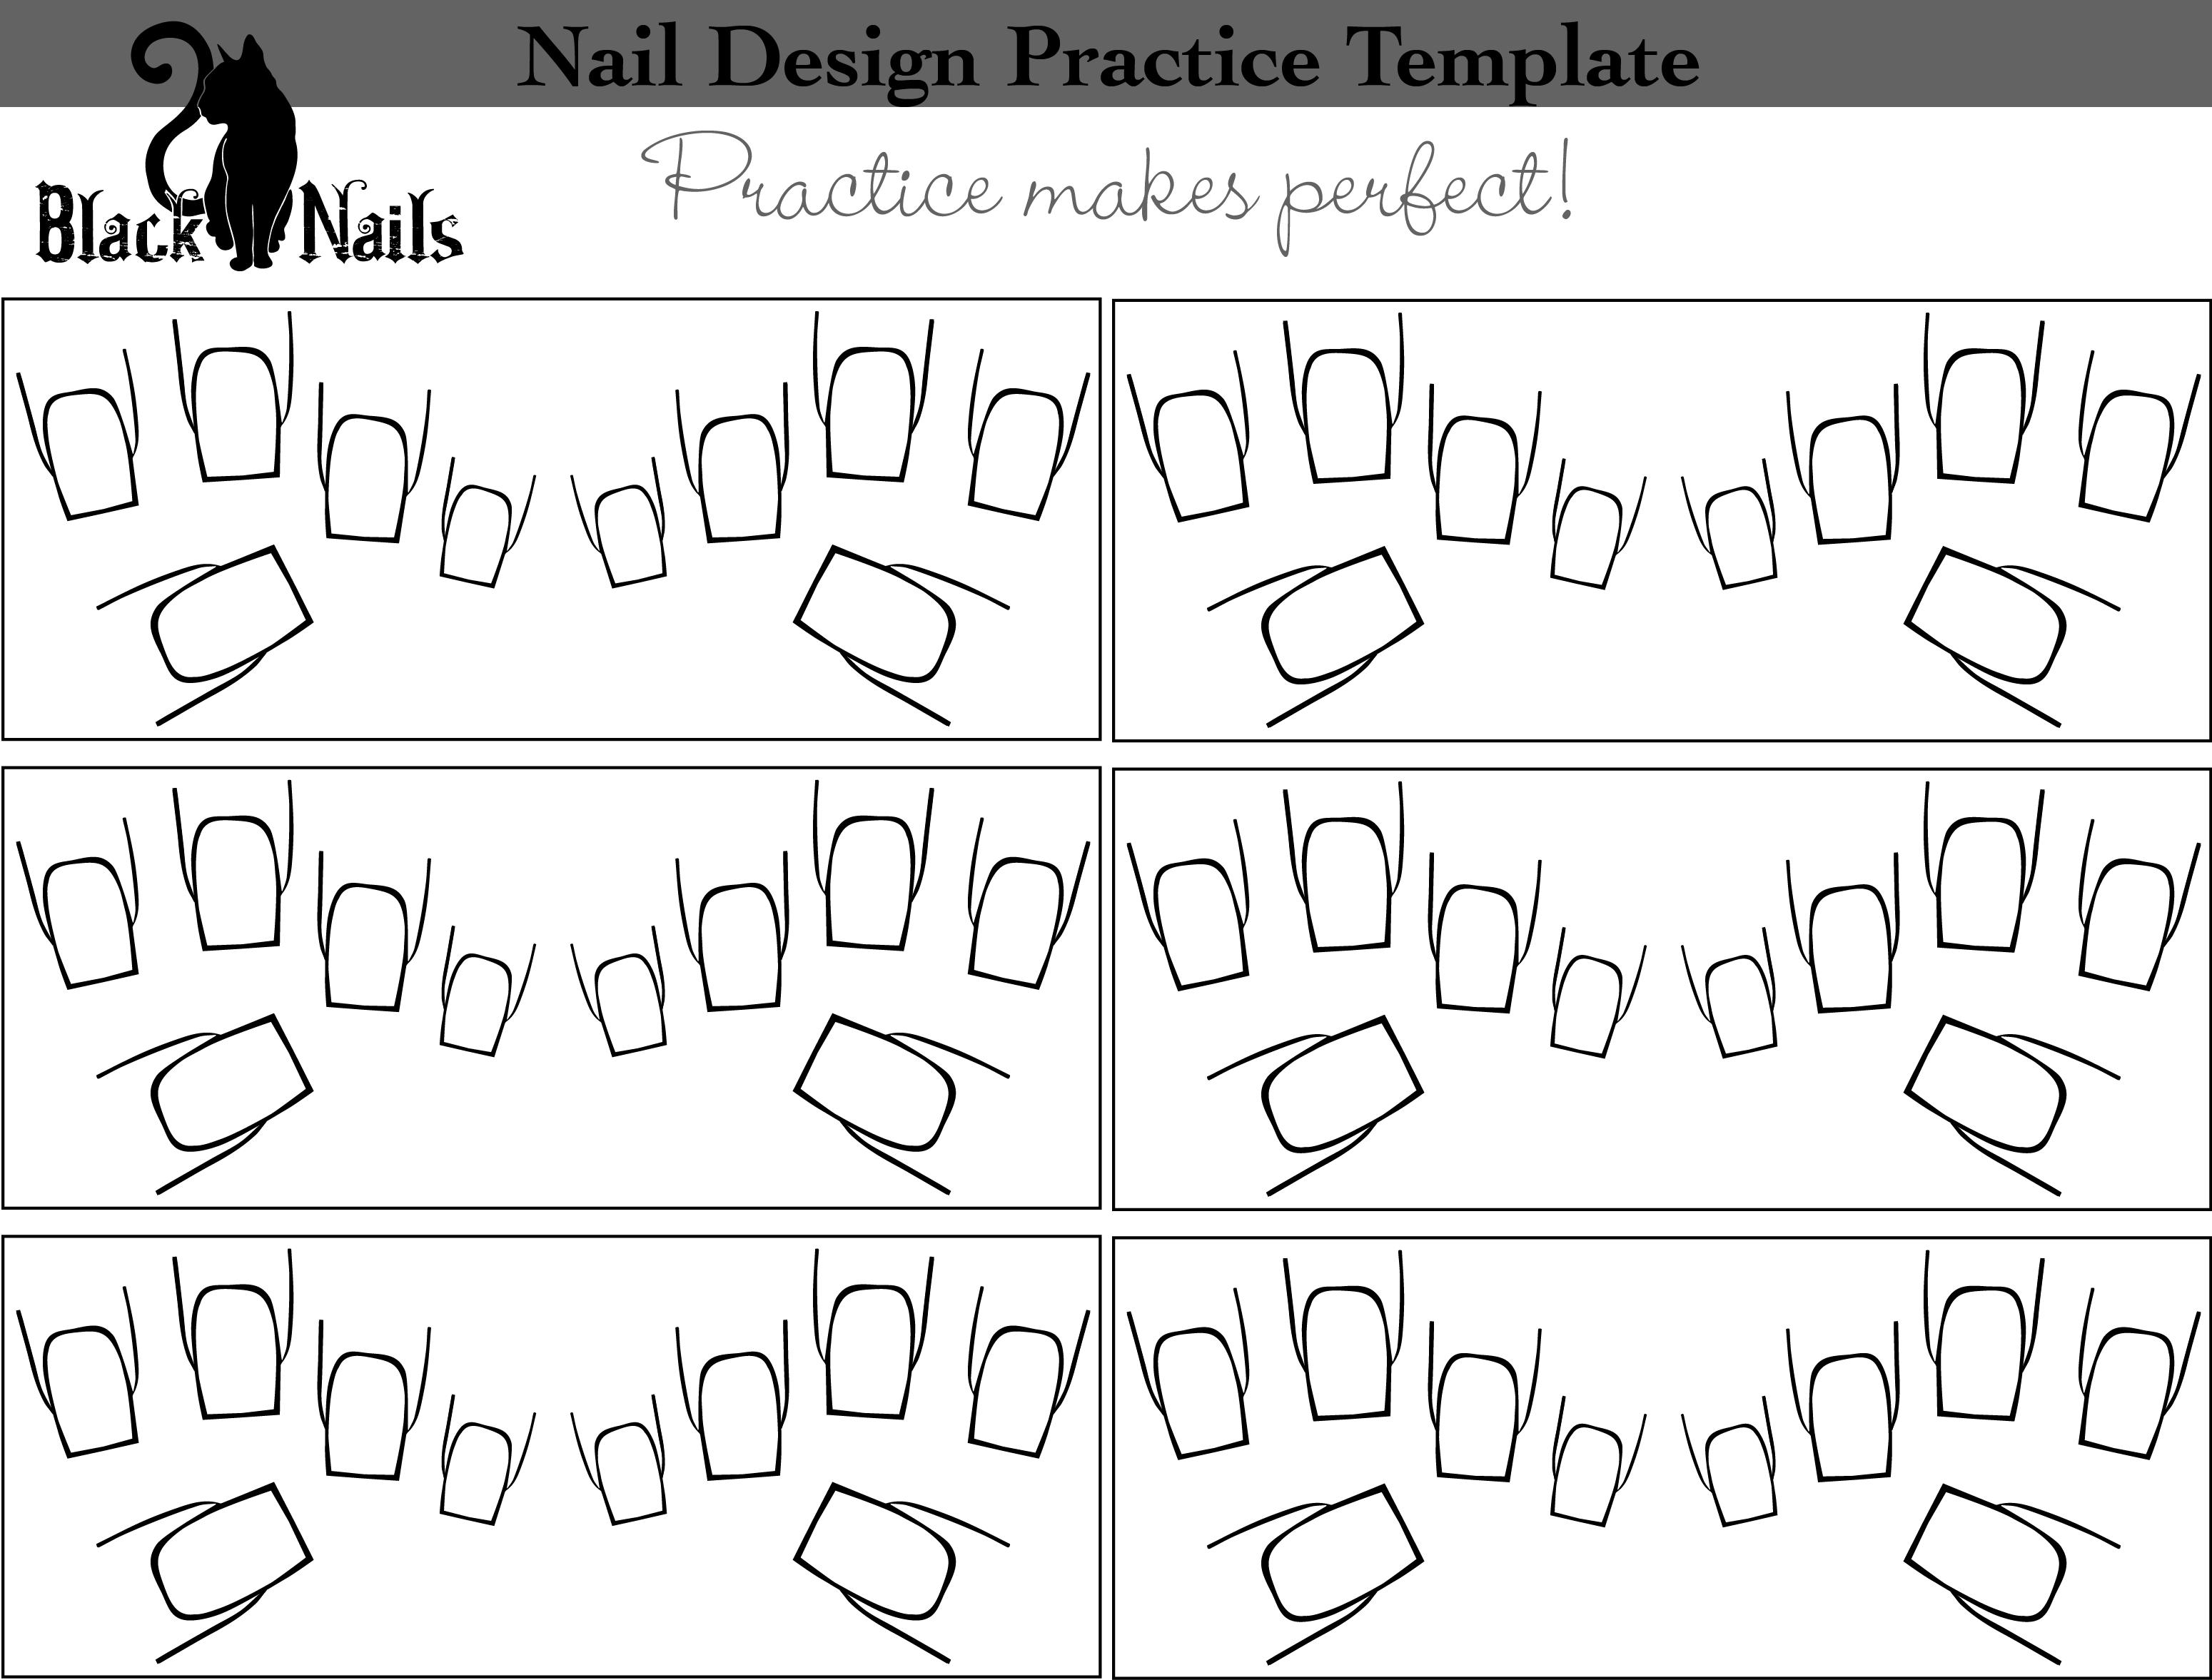 Nail Art Design Practice Sheet